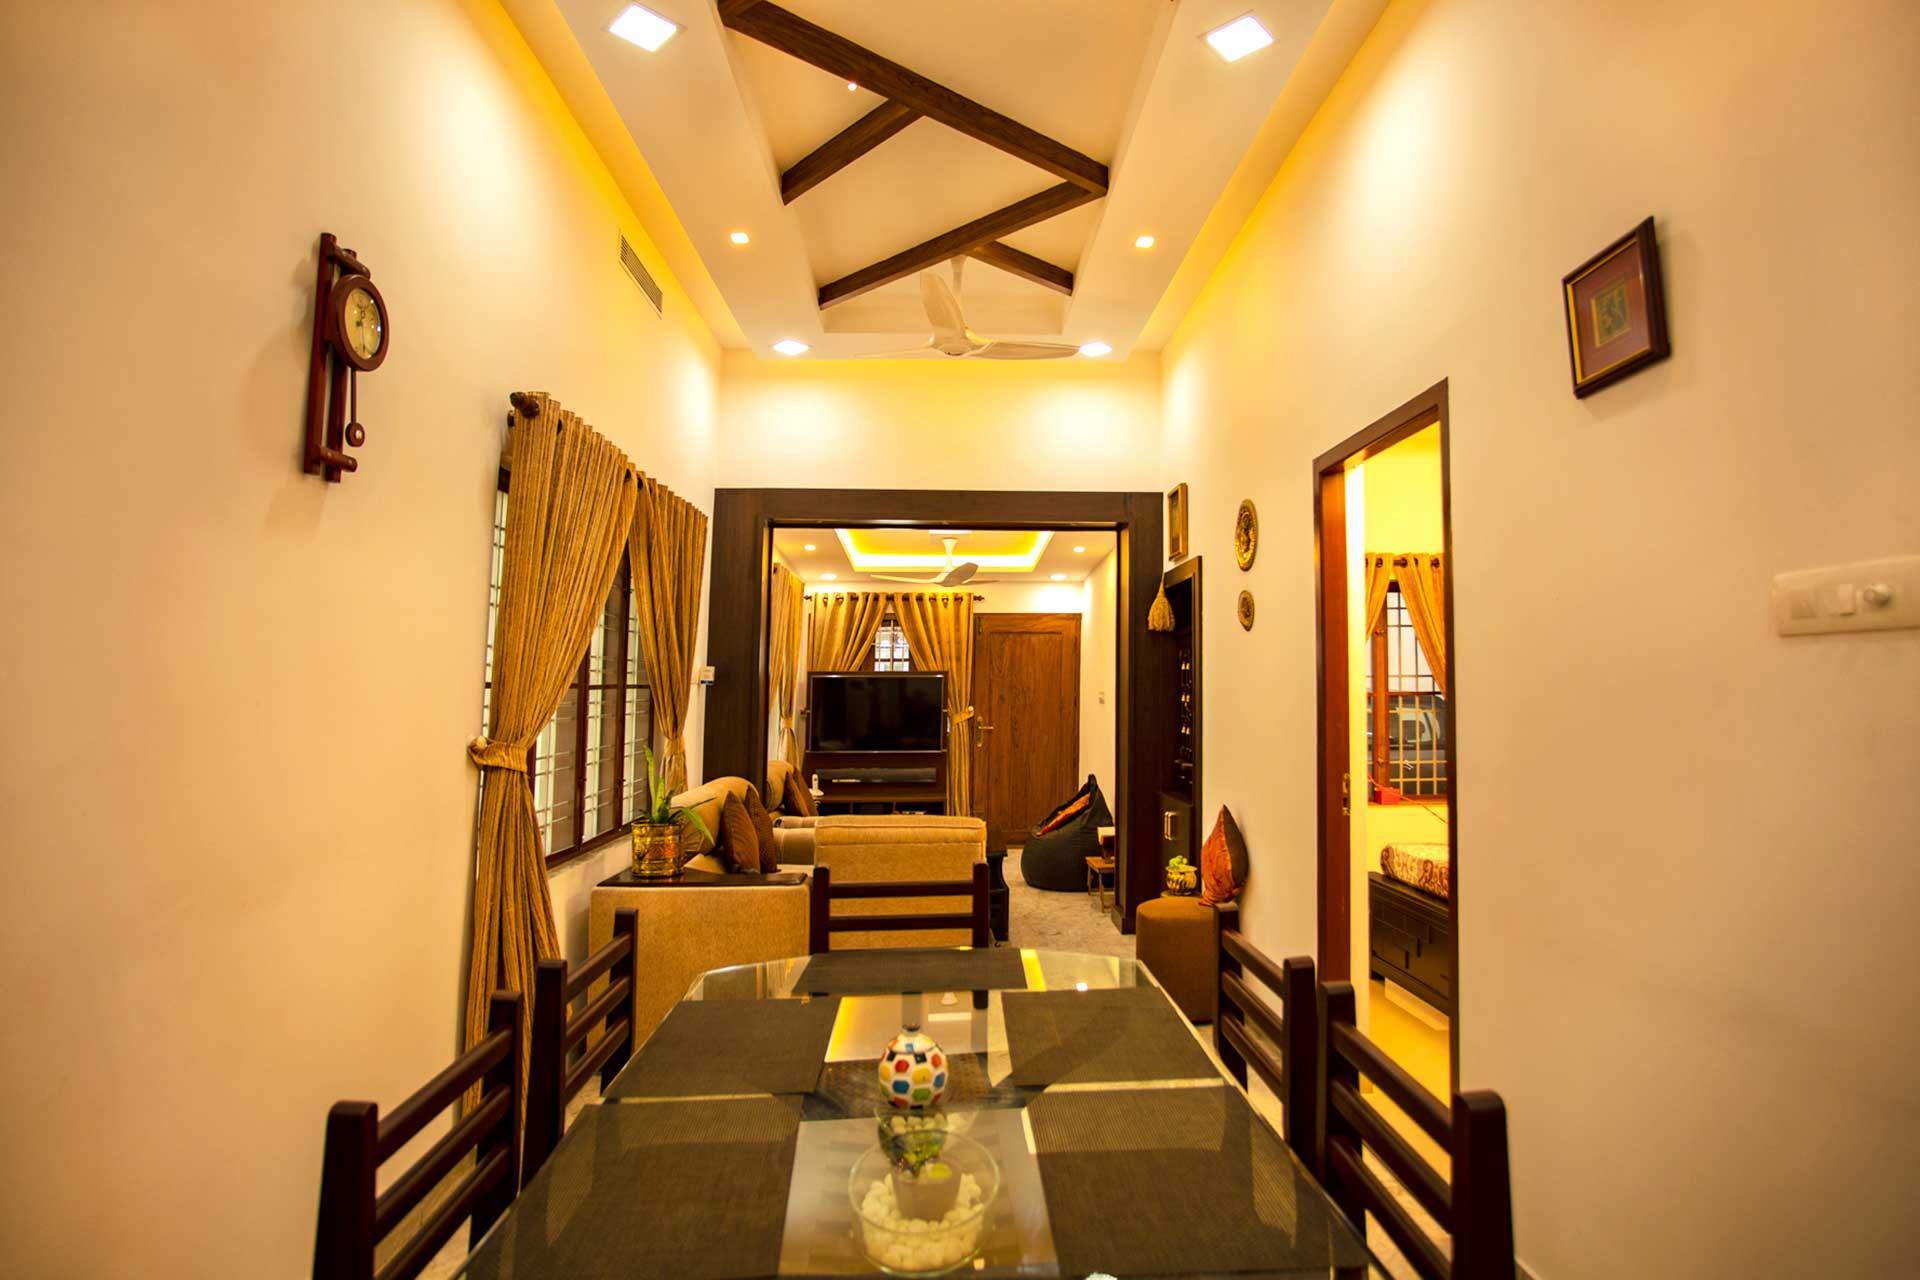 Dining room interior design1